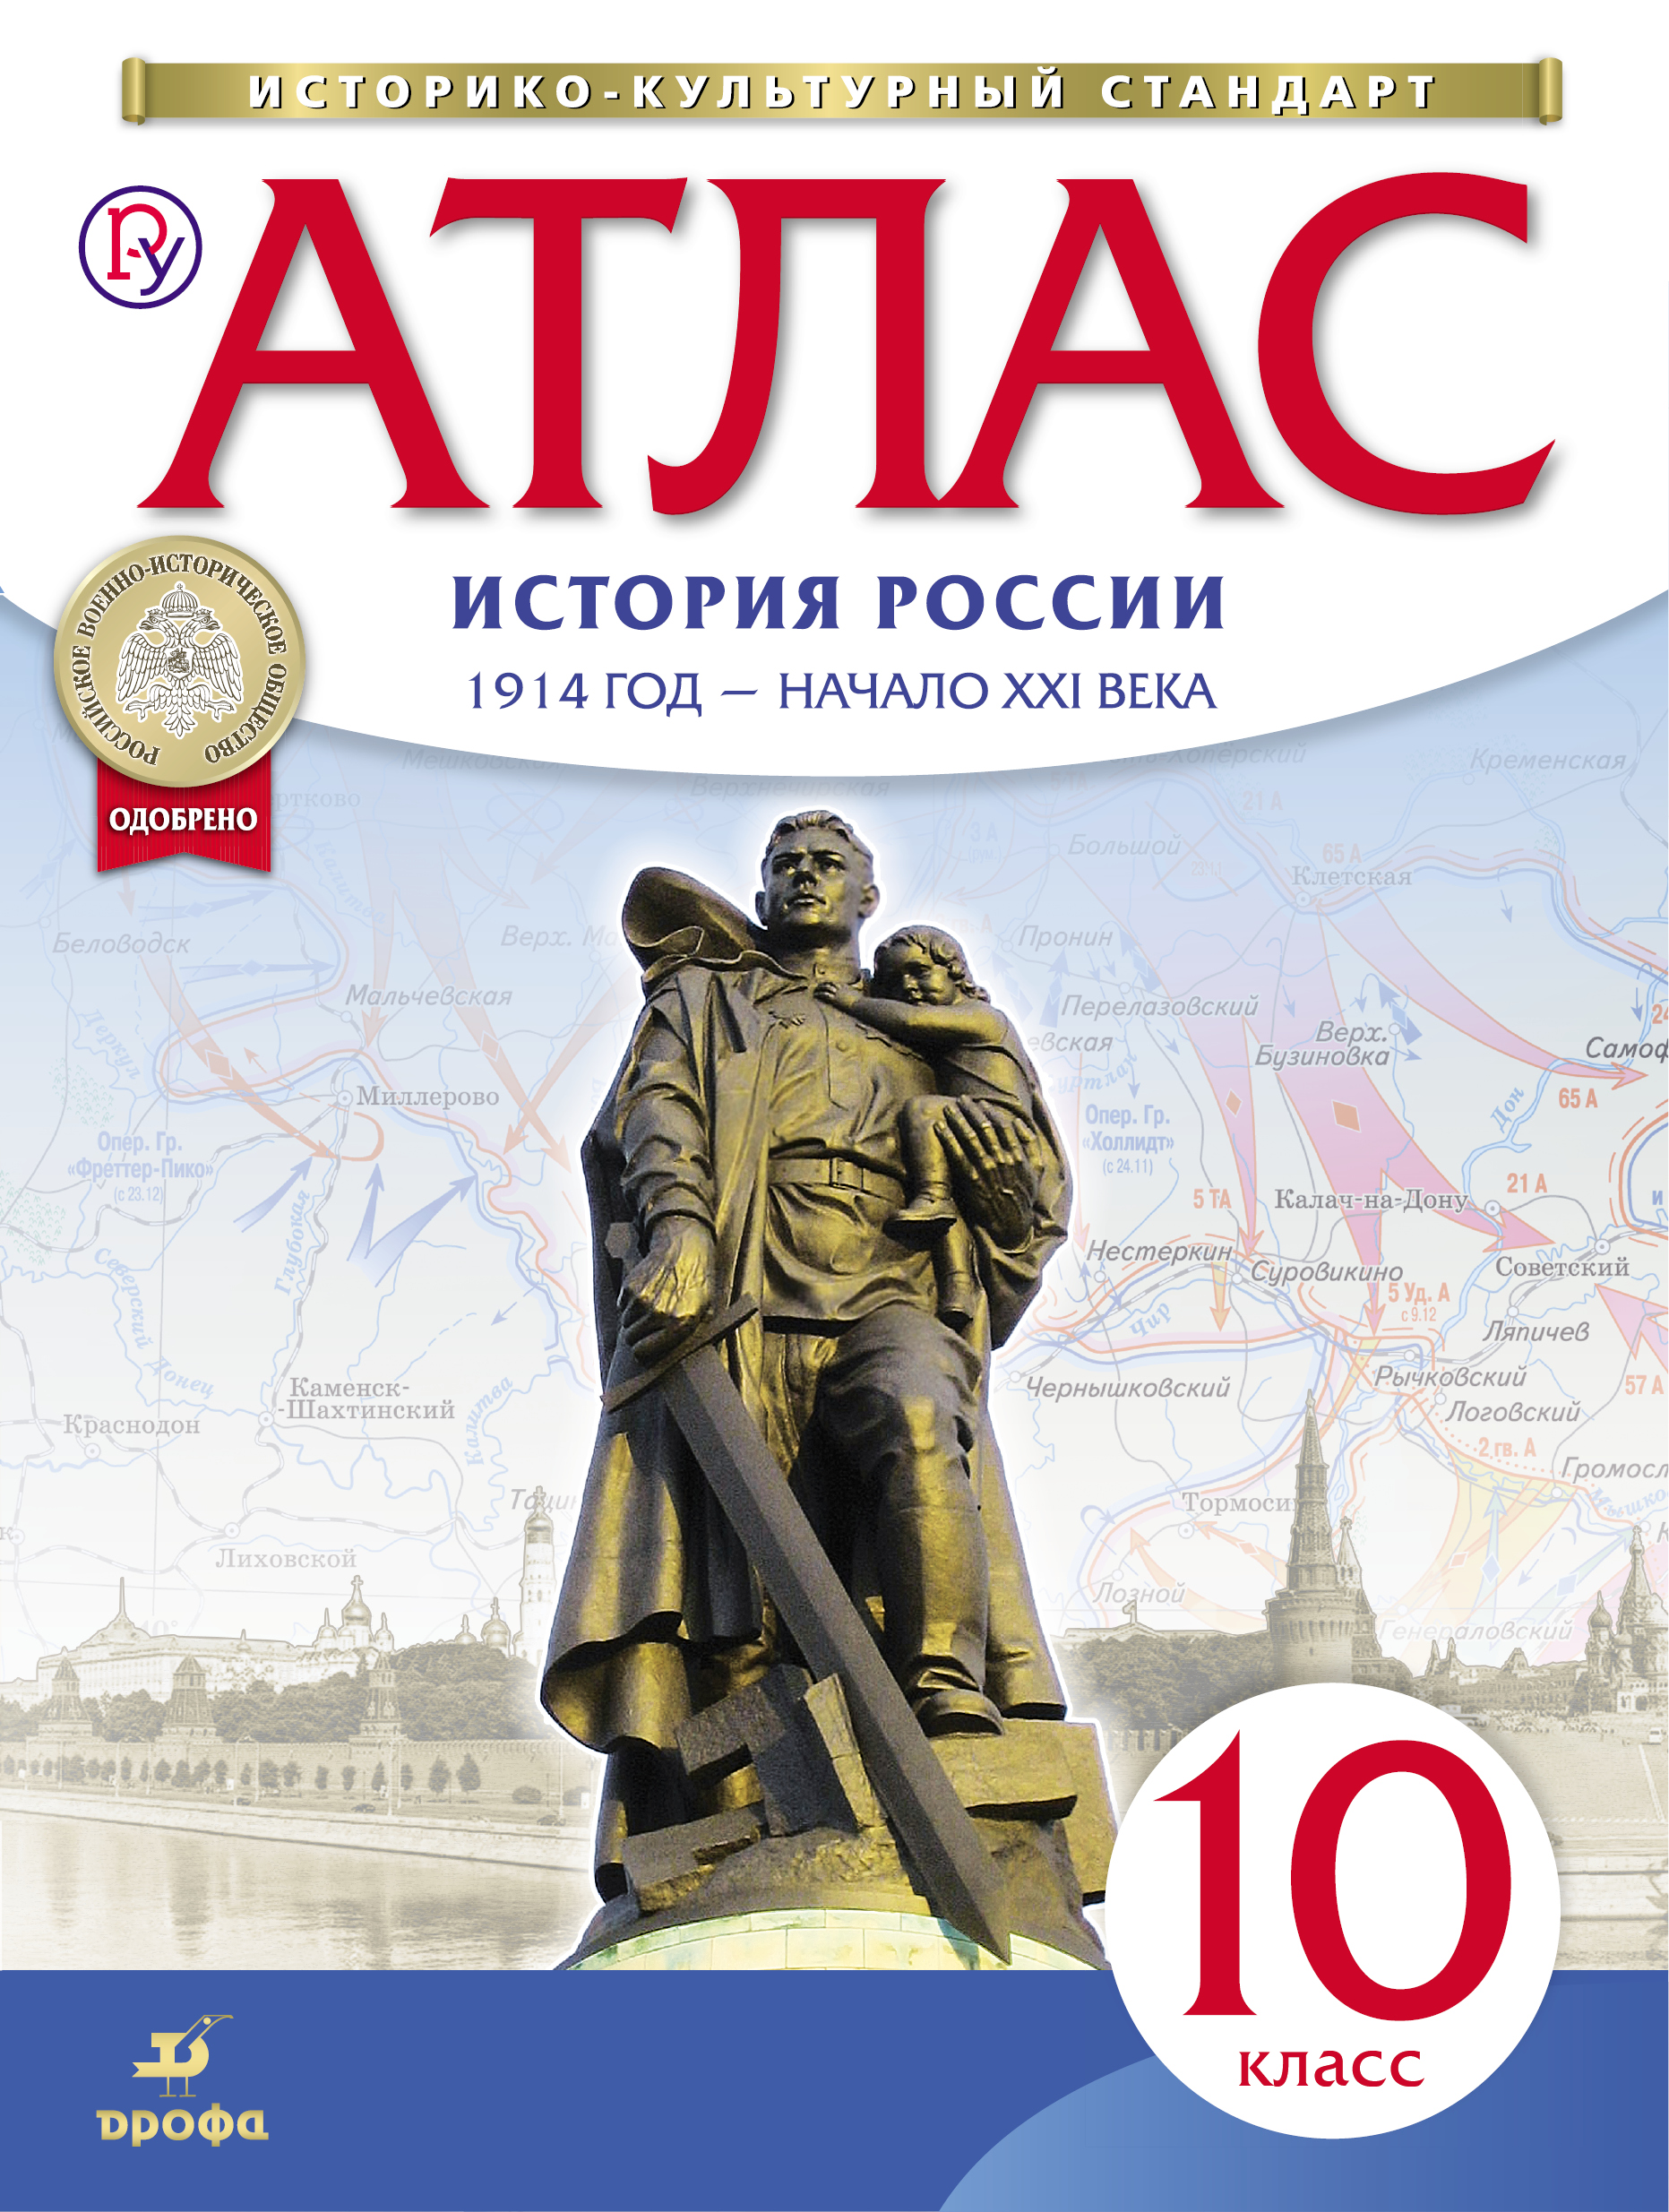 Атлас по истории России. 10 класс. 1914 год - начало XXI века